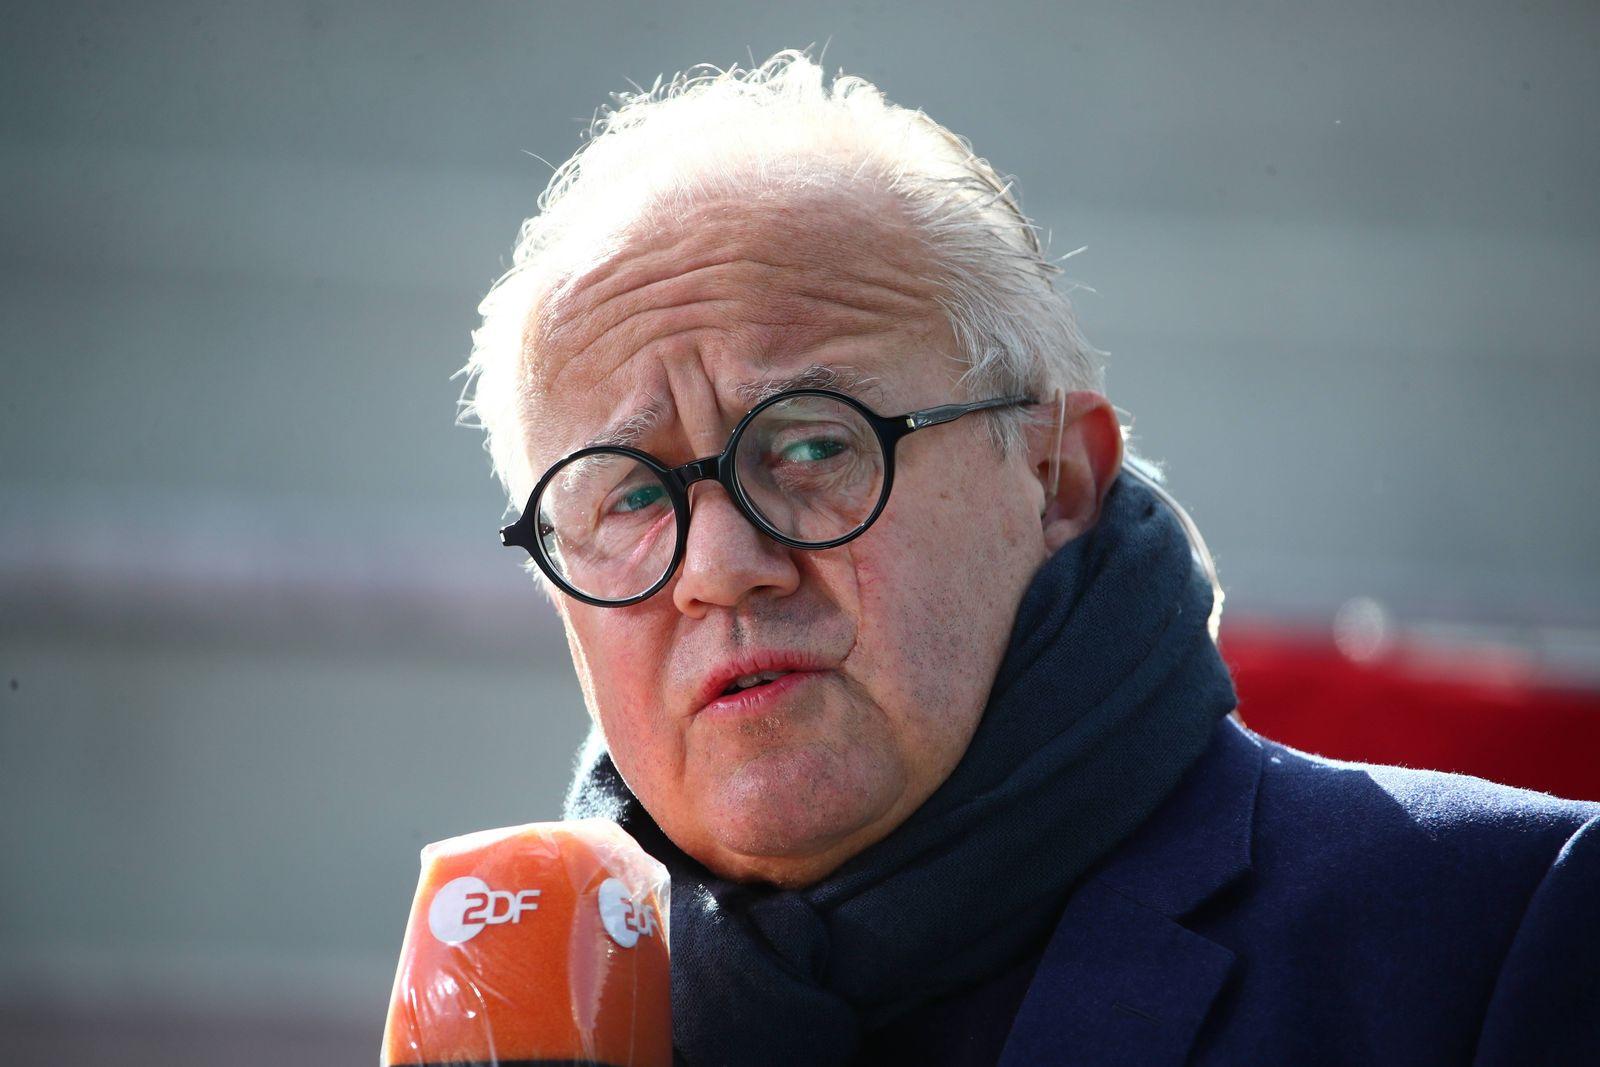 DFB-Praesident Fritz Keller Deutschland vs Norwegen, Fussball, Frauen-Laenderspiel, 13.04.2021 DFB regulations prohibit